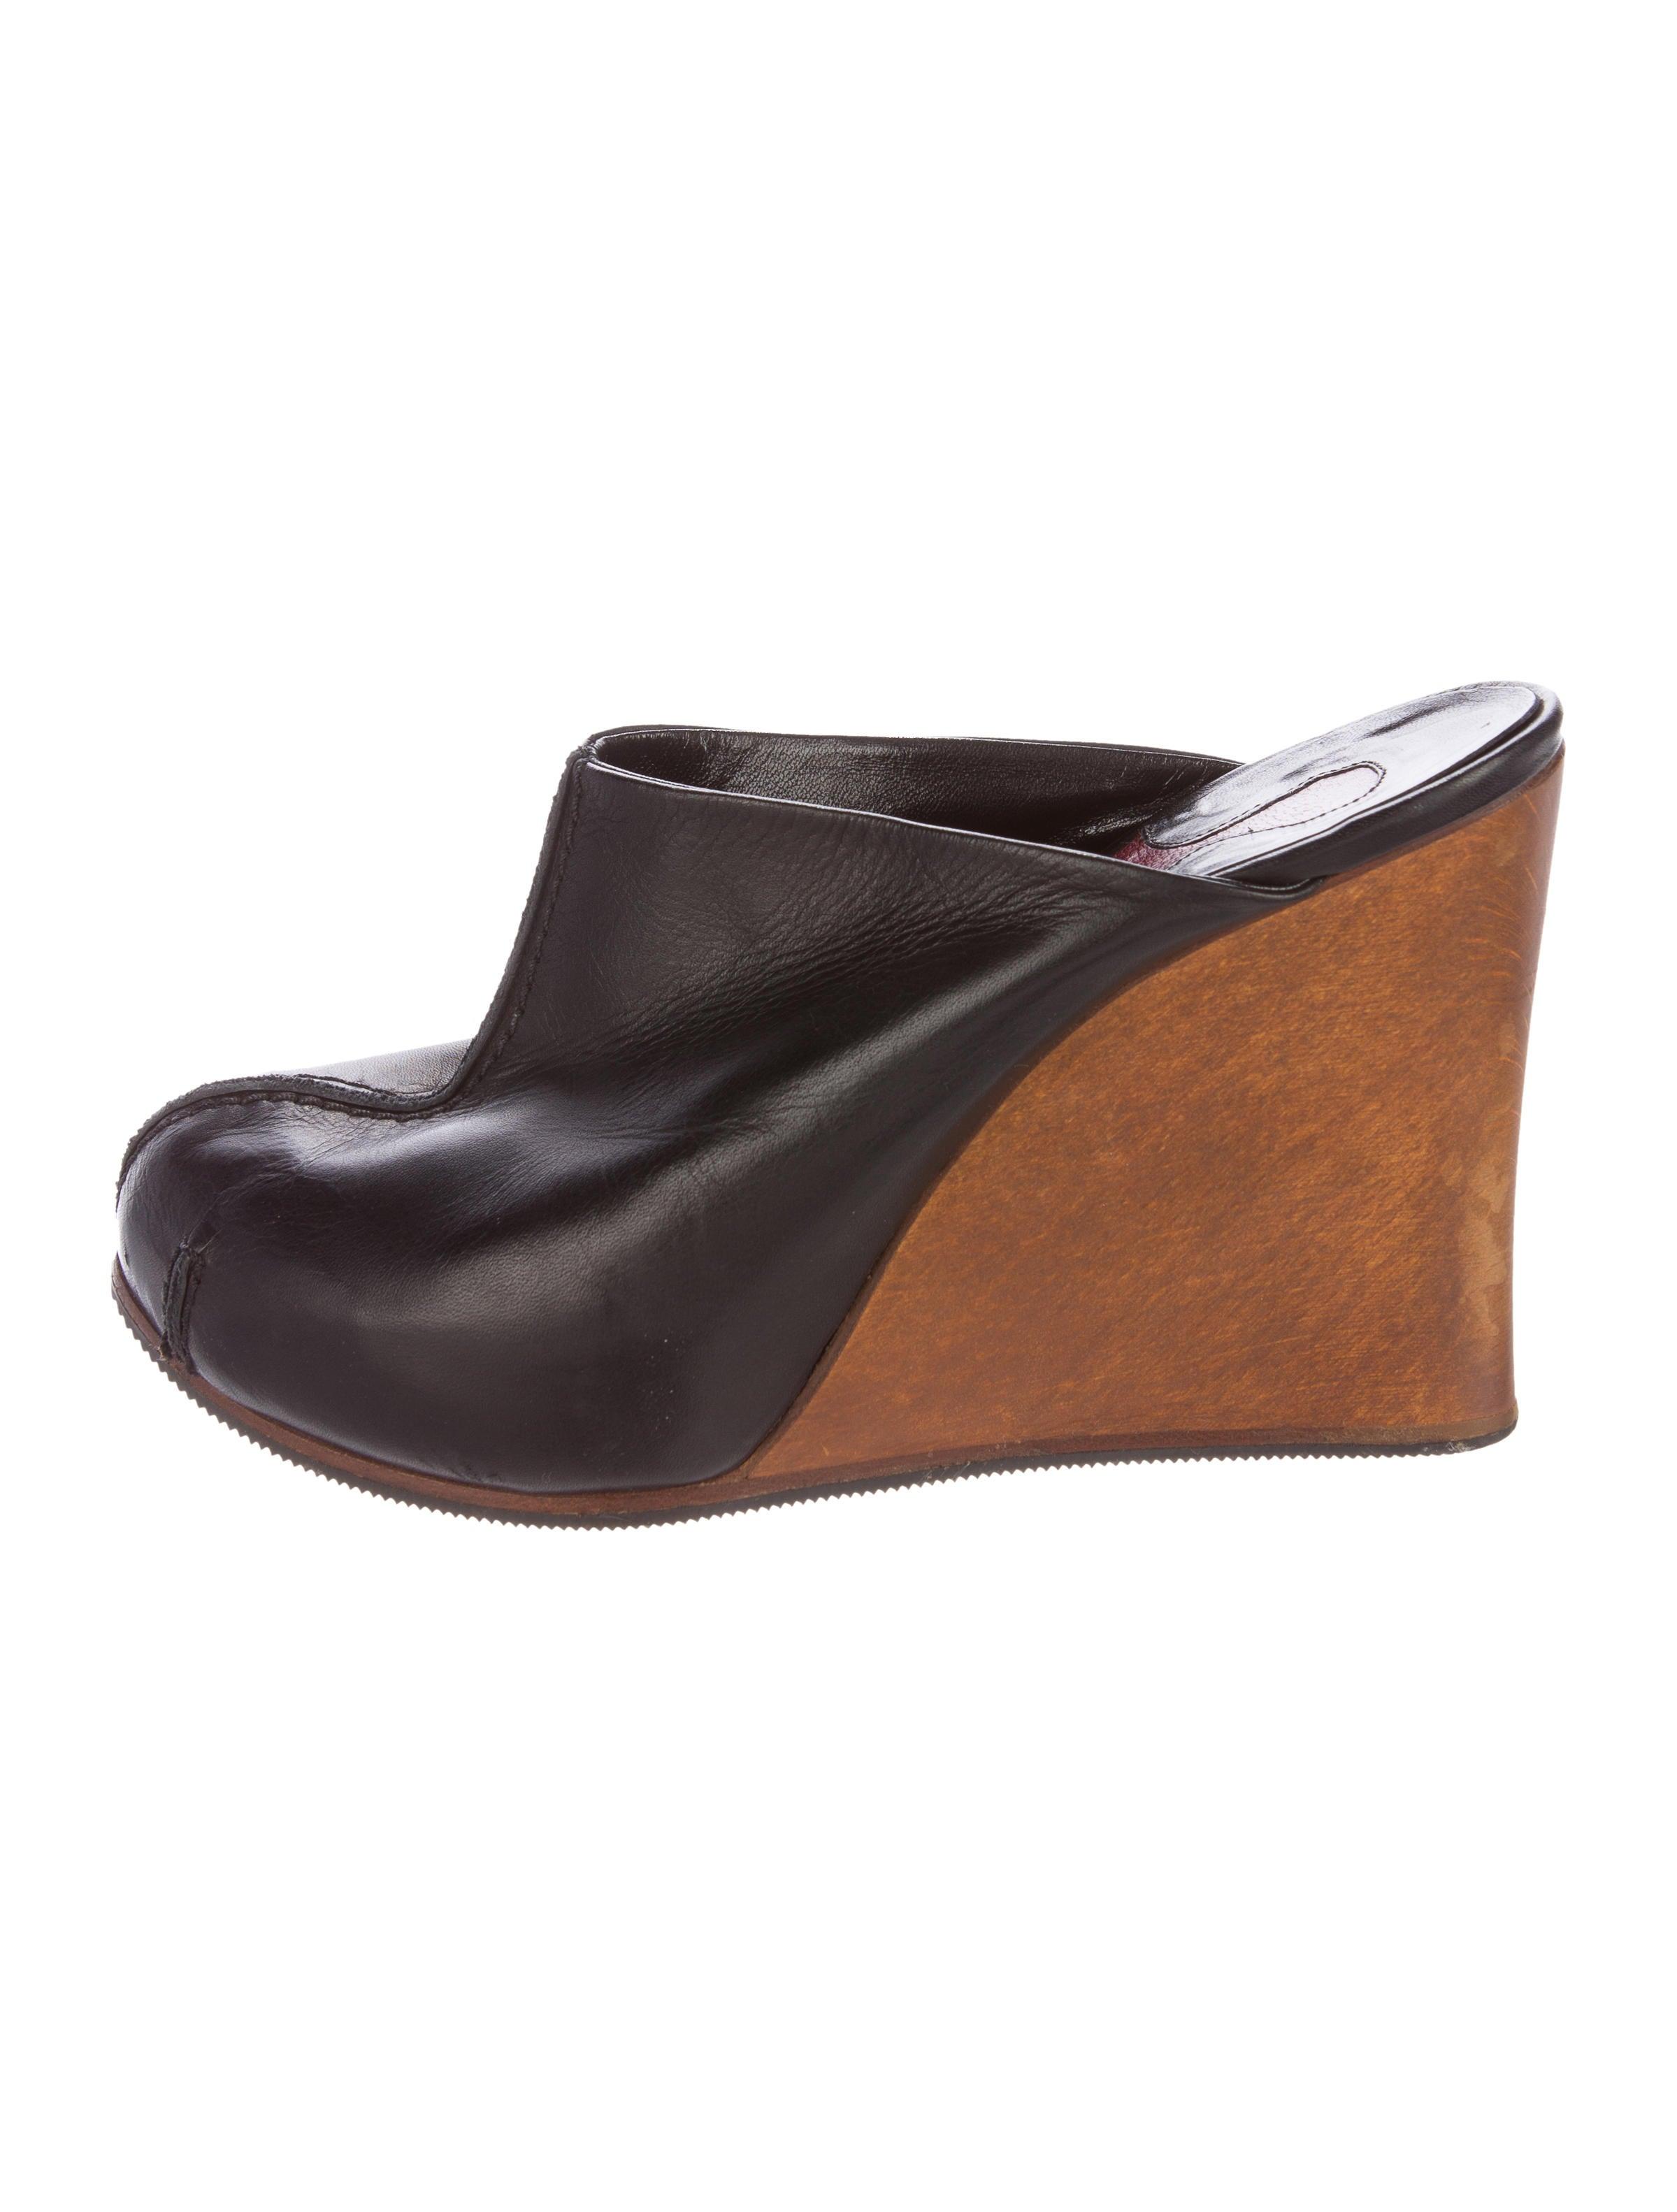 Mens Leather Mules - results from brands Bella Vita, Steve Madden, Brinley, products like Kristin Cavallari - Capri Mule (Gold Leather) Women's Slip on Shoes, Easy Spirit Travelport 19 Clogs Natural, Men's Drew Jackson Mule.